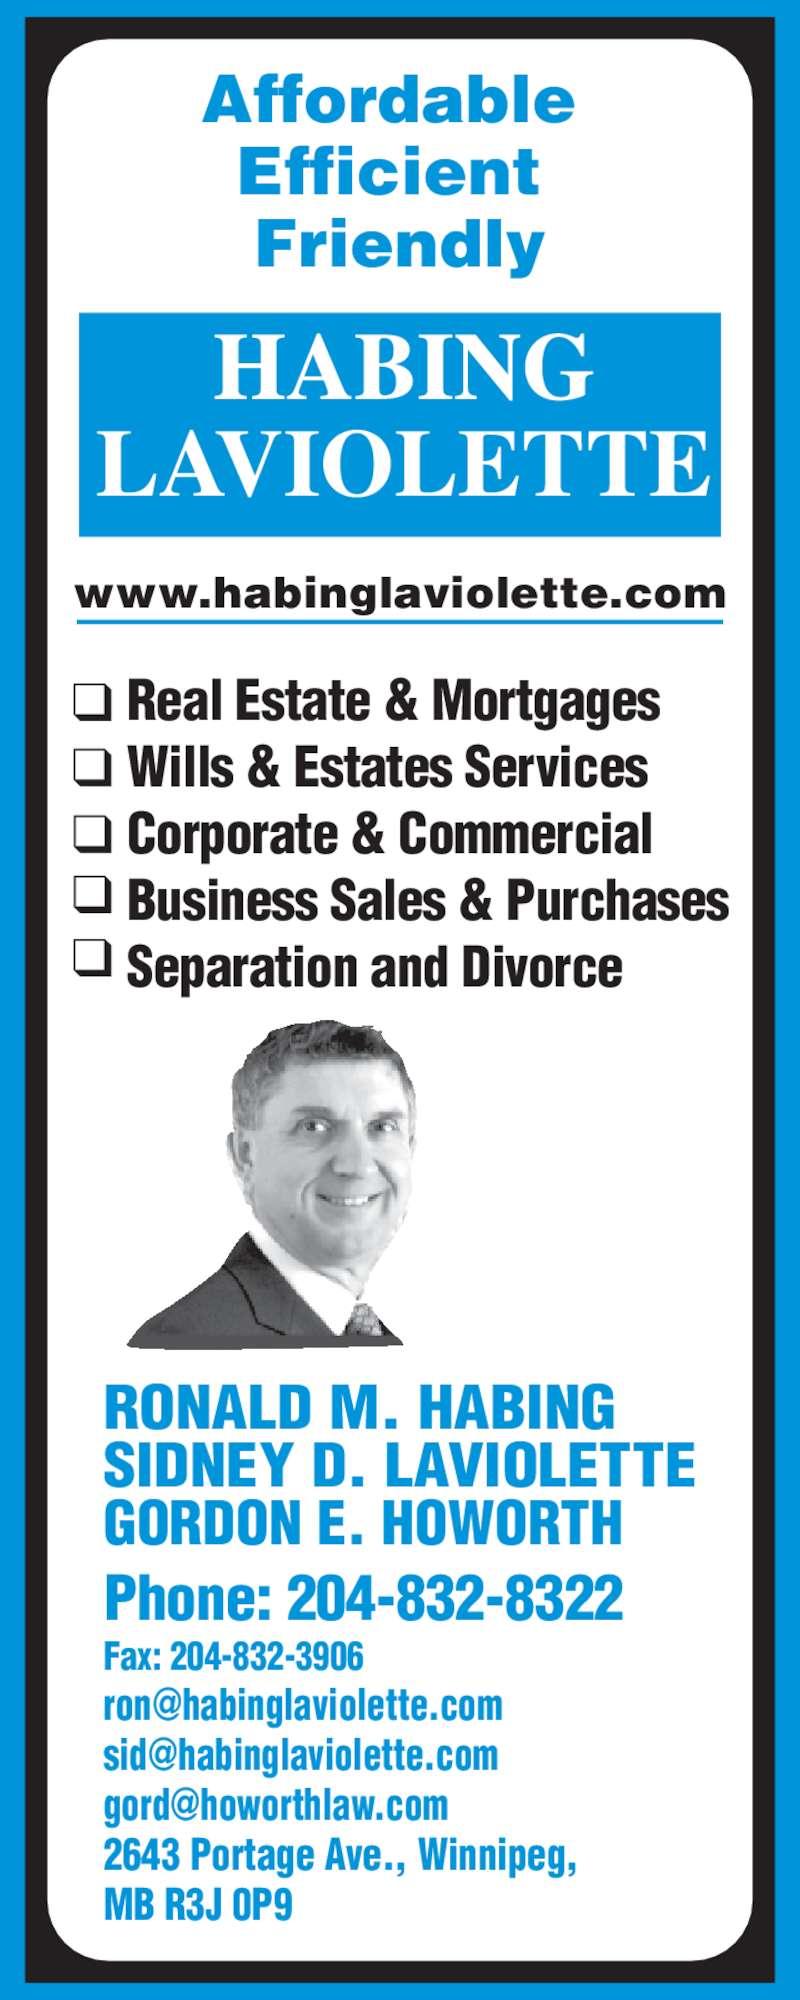 Habing Laviolette (204-832-8322) - Display Ad - Affordable  Efficient  Friendly LAVIOLETTE SIDNEY D. LAVIOLETTE Phone: 204-832-8322 www.habinglaviolette.com RONALD M. HABING Fax: 204-832-3906 GORDON E. HOWORTH 2643 Portage Ave., Winnipeg,  MB R3J 0P9 Real Estate & Mortgages Wills & Estates Services Corporate & Commercial Business Sales & Purchases Separation and Divorce